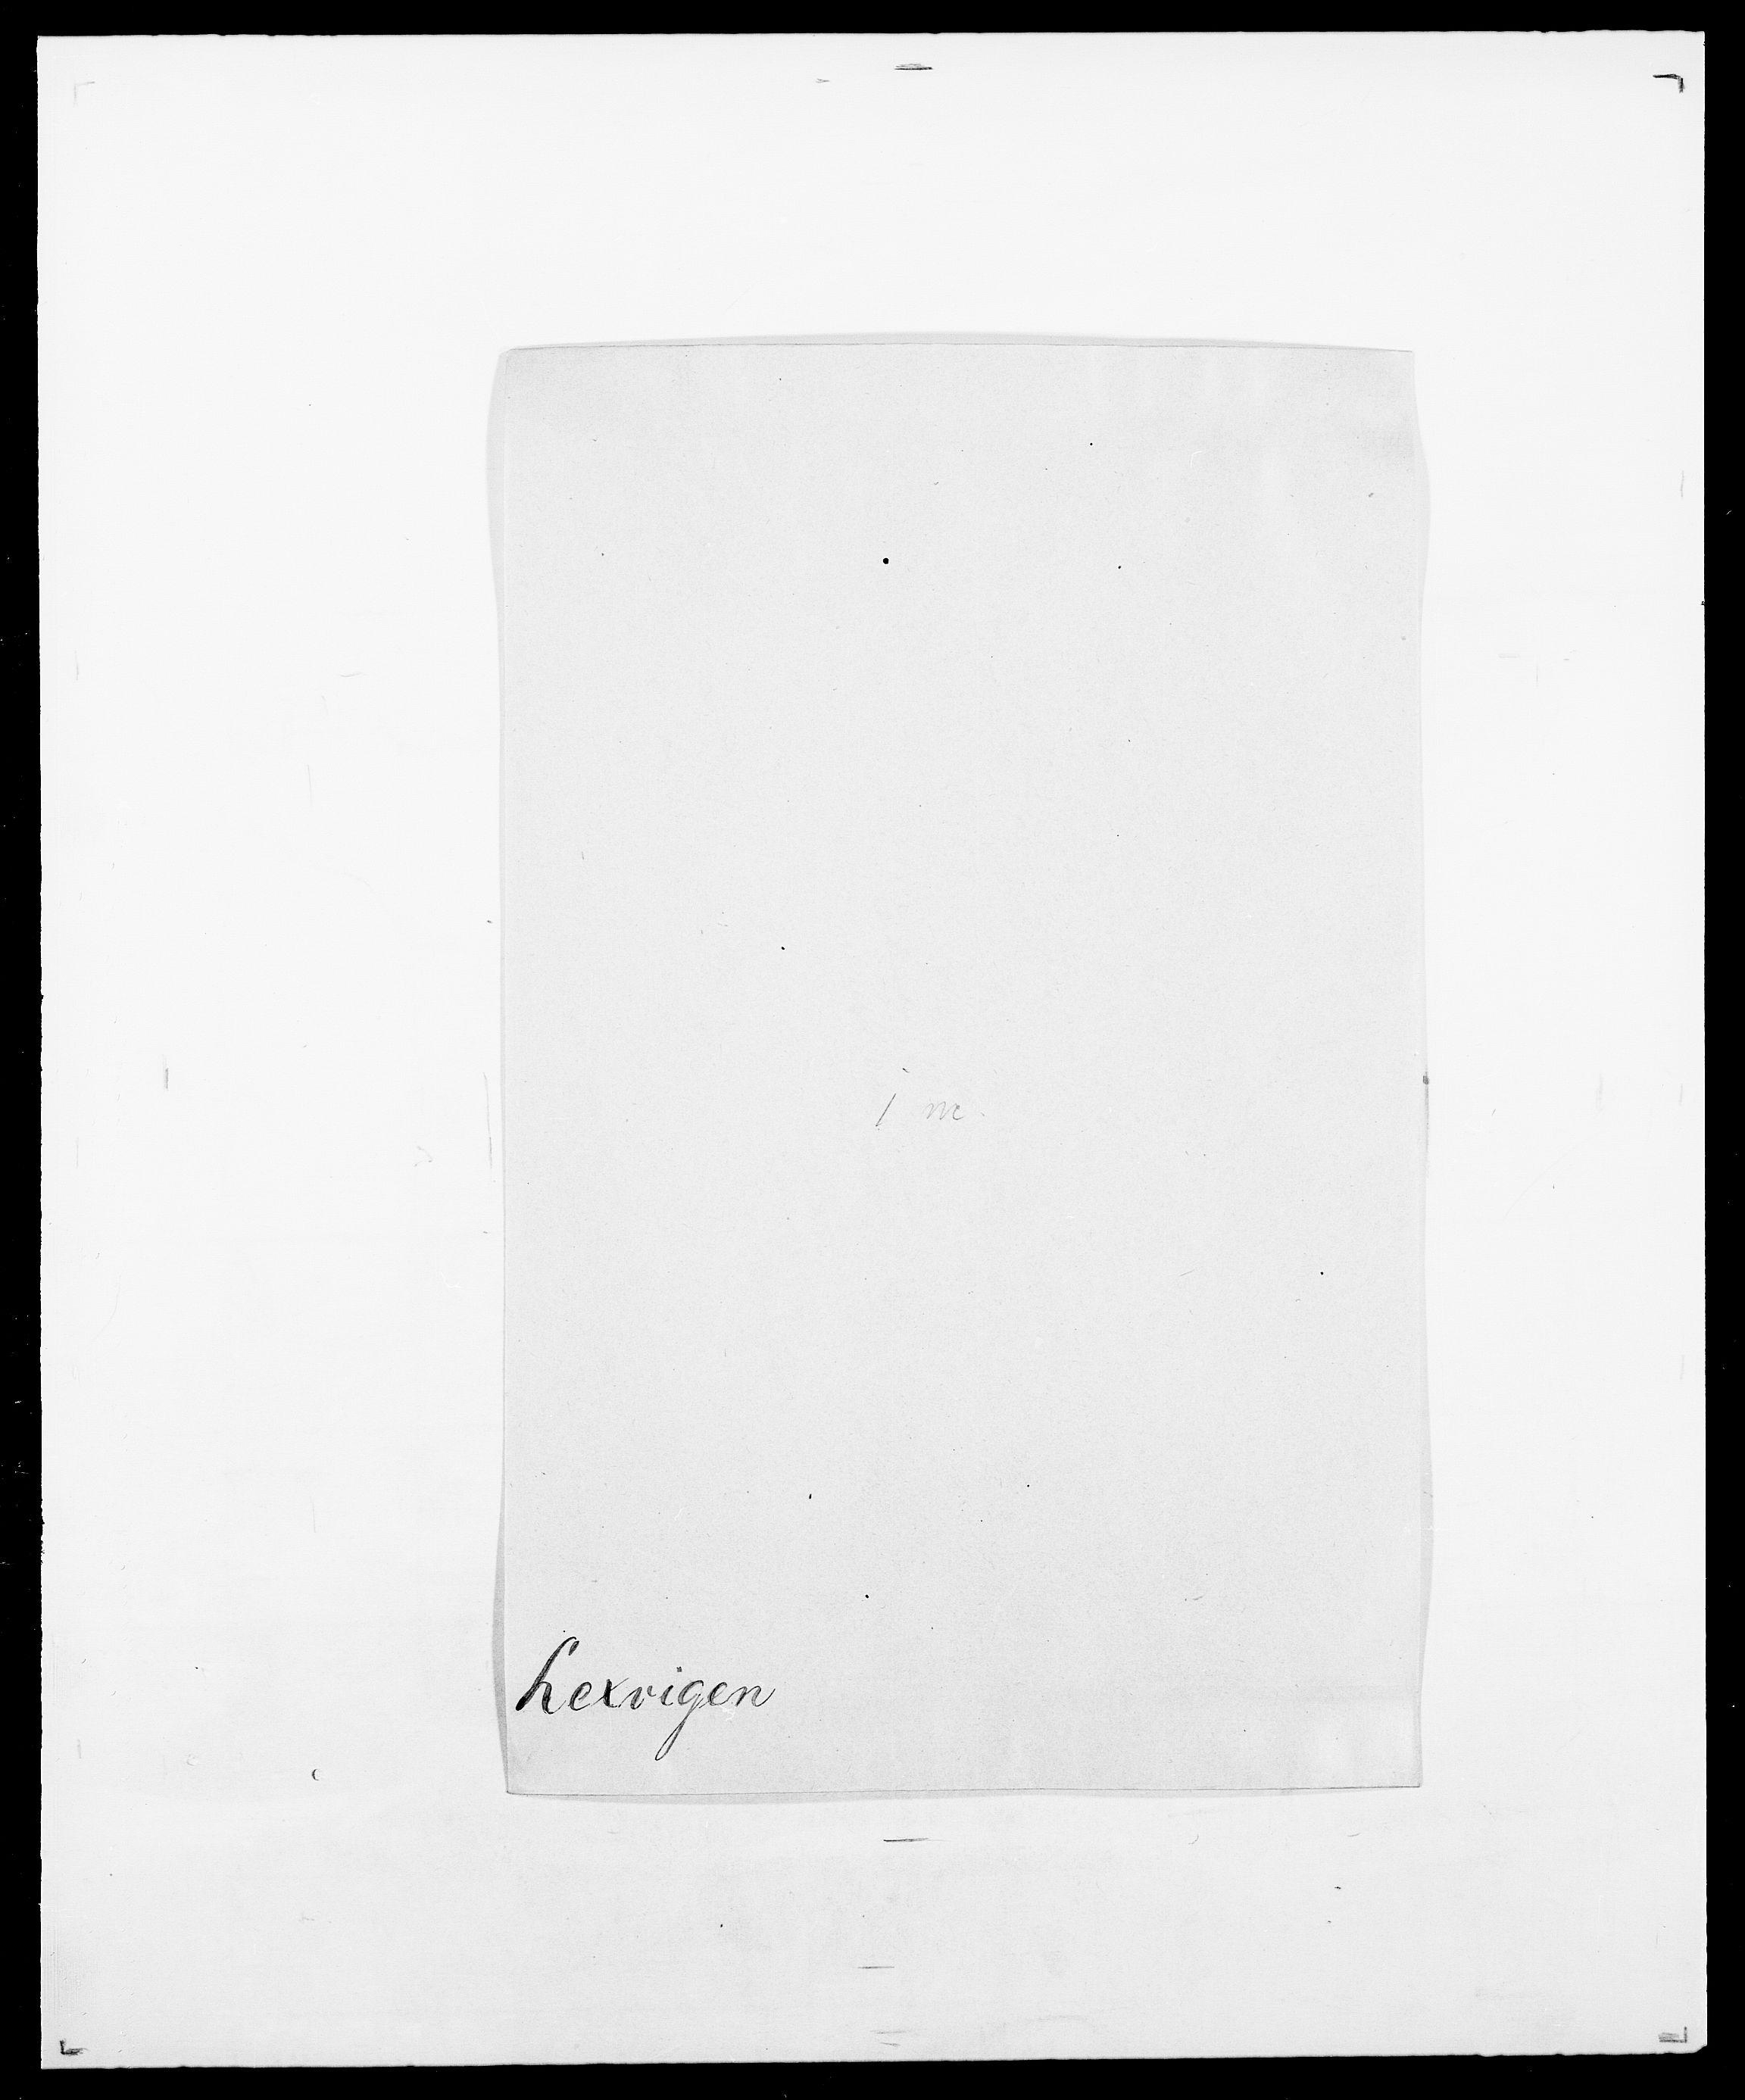 SAO, Delgobe, Charles Antoine - samling, D/Da/L0023: Lau - Lirvyn, s. 313